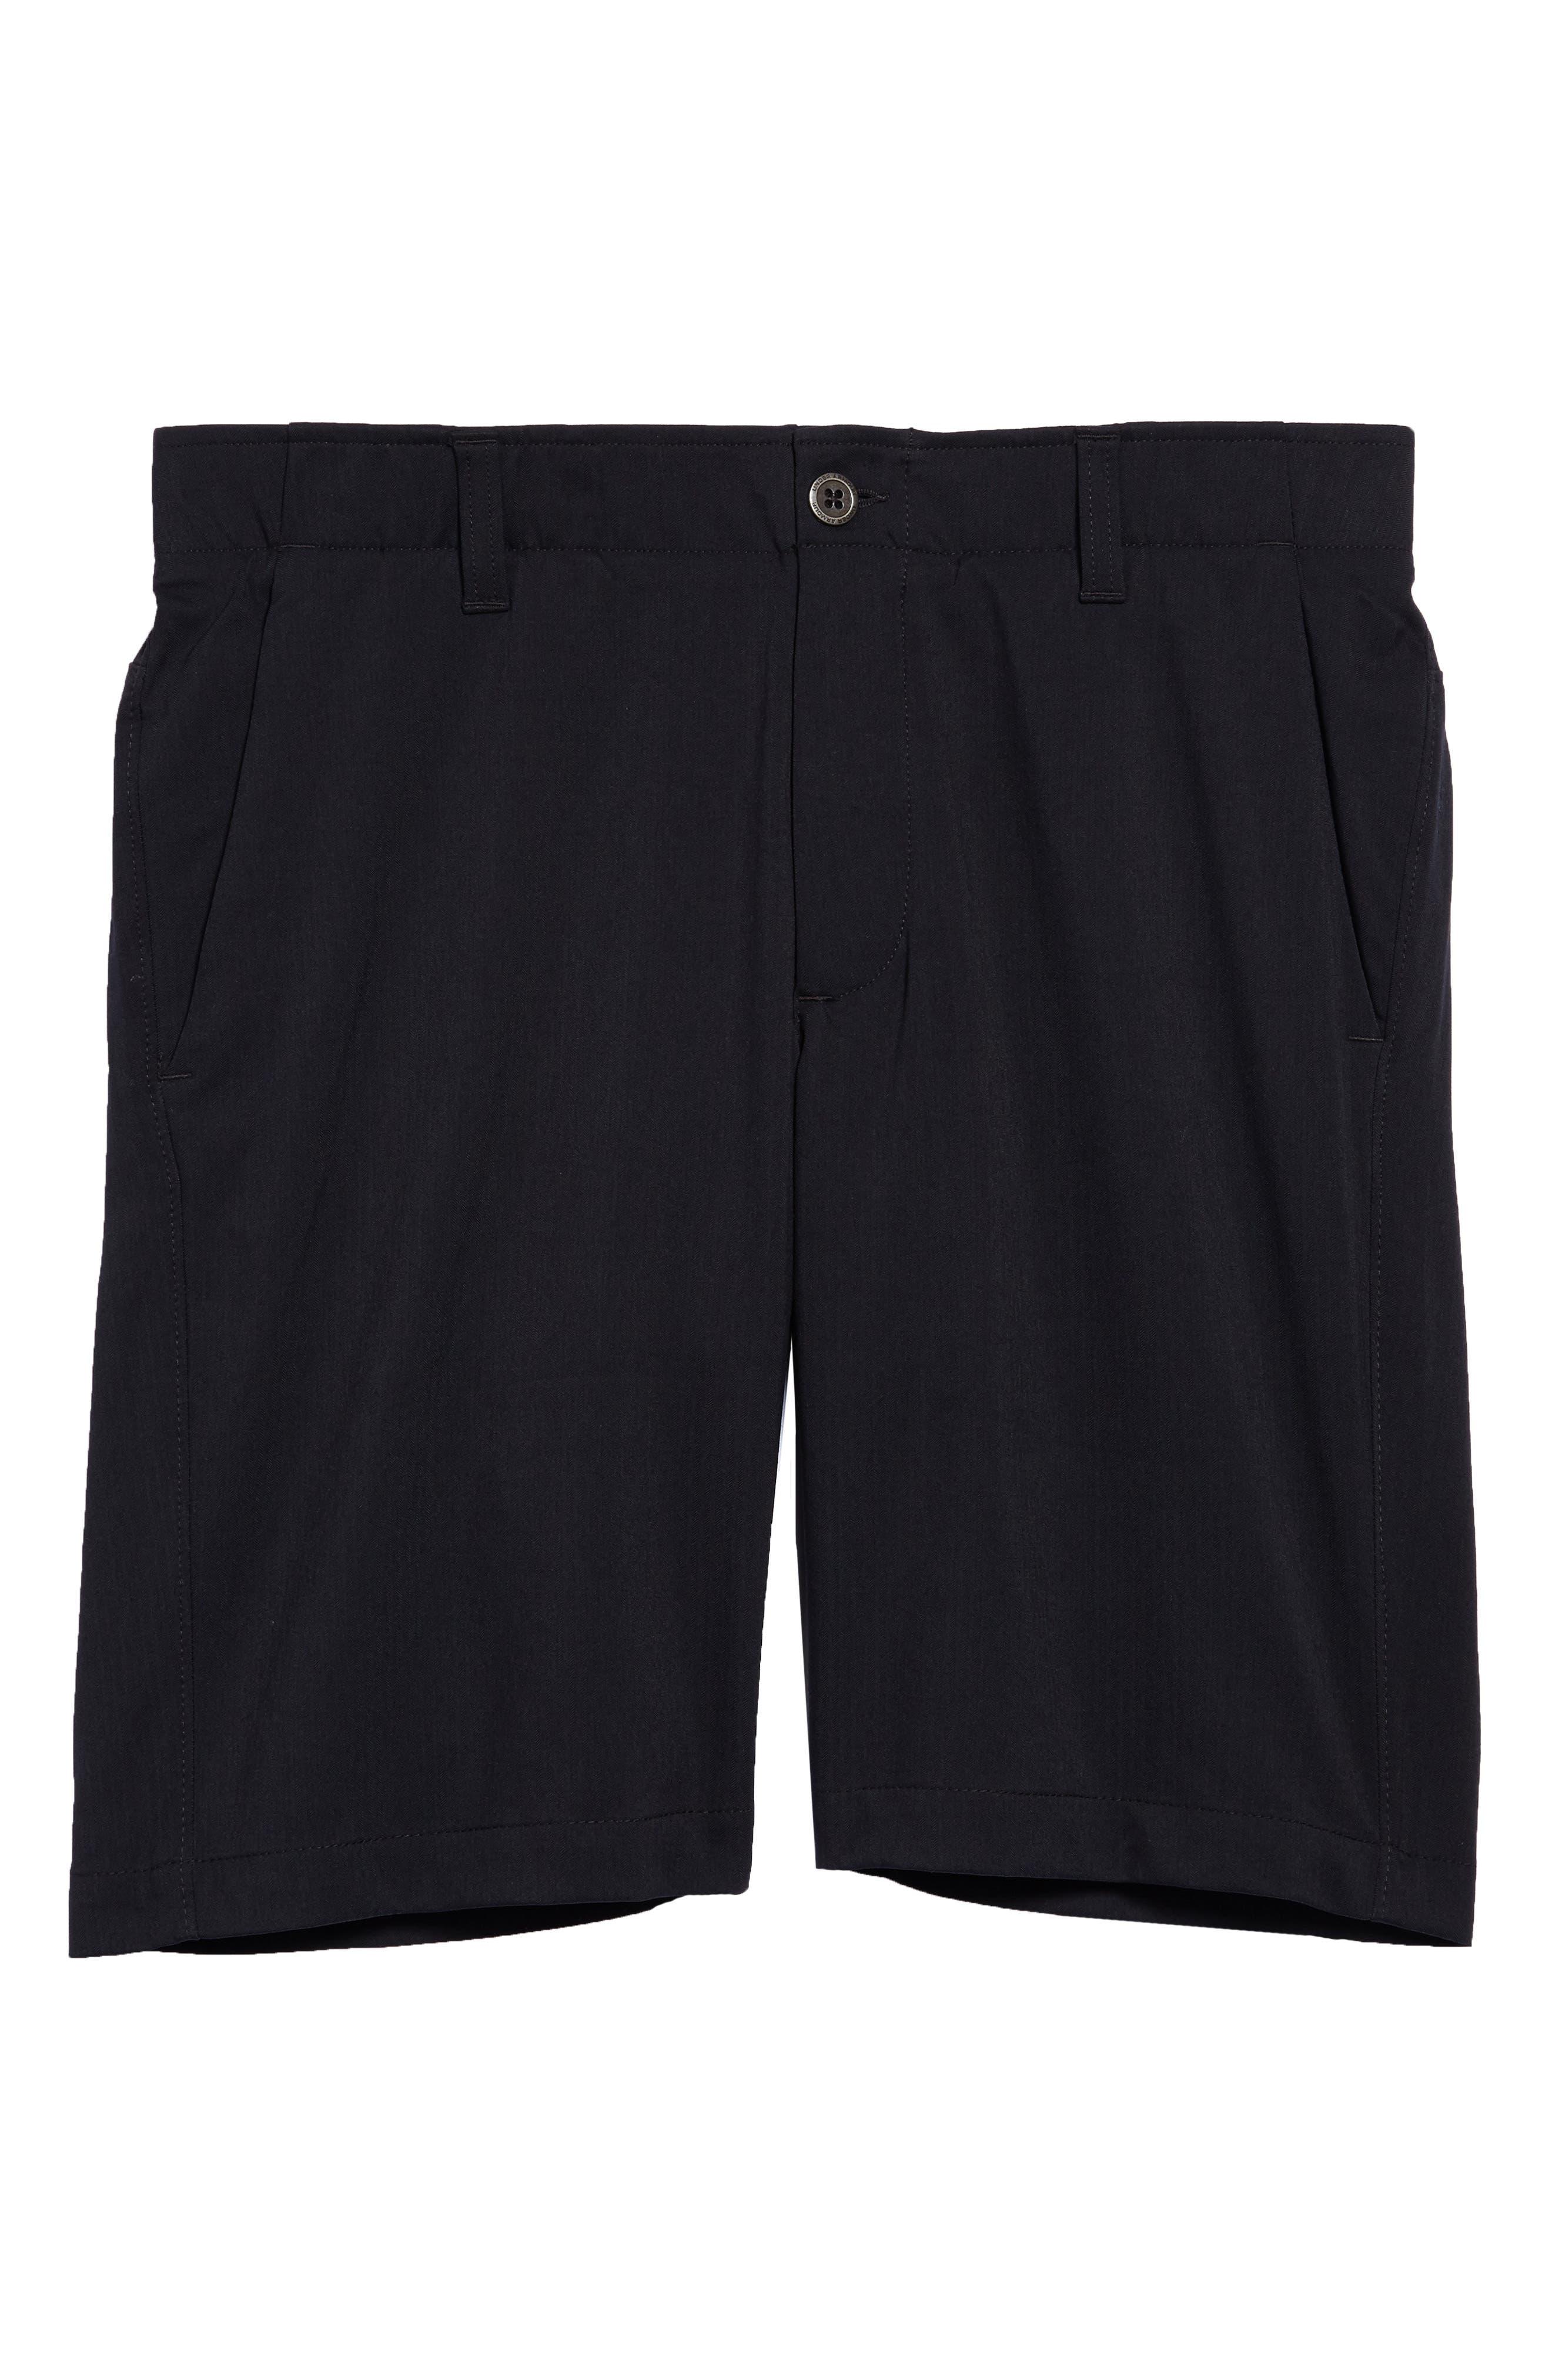 Takeover Regular Fit Golf Shorts,                             Alternate thumbnail 6, color,                             BLACK